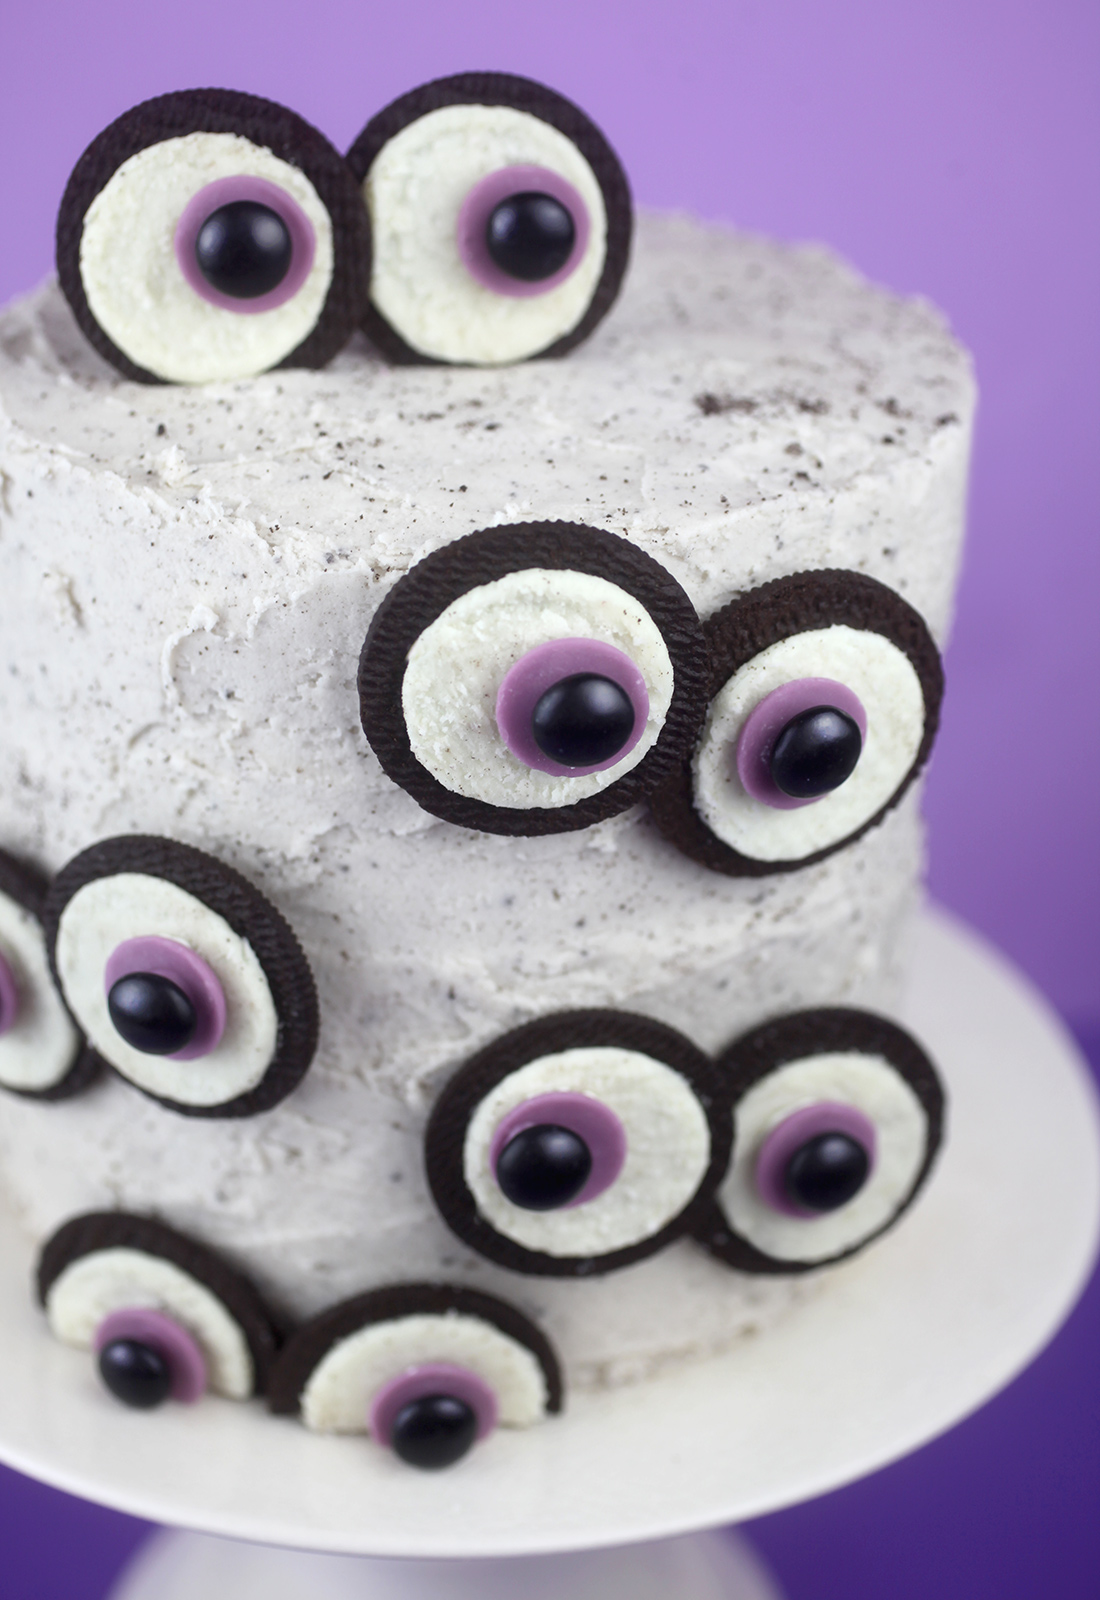 Oreo eyes